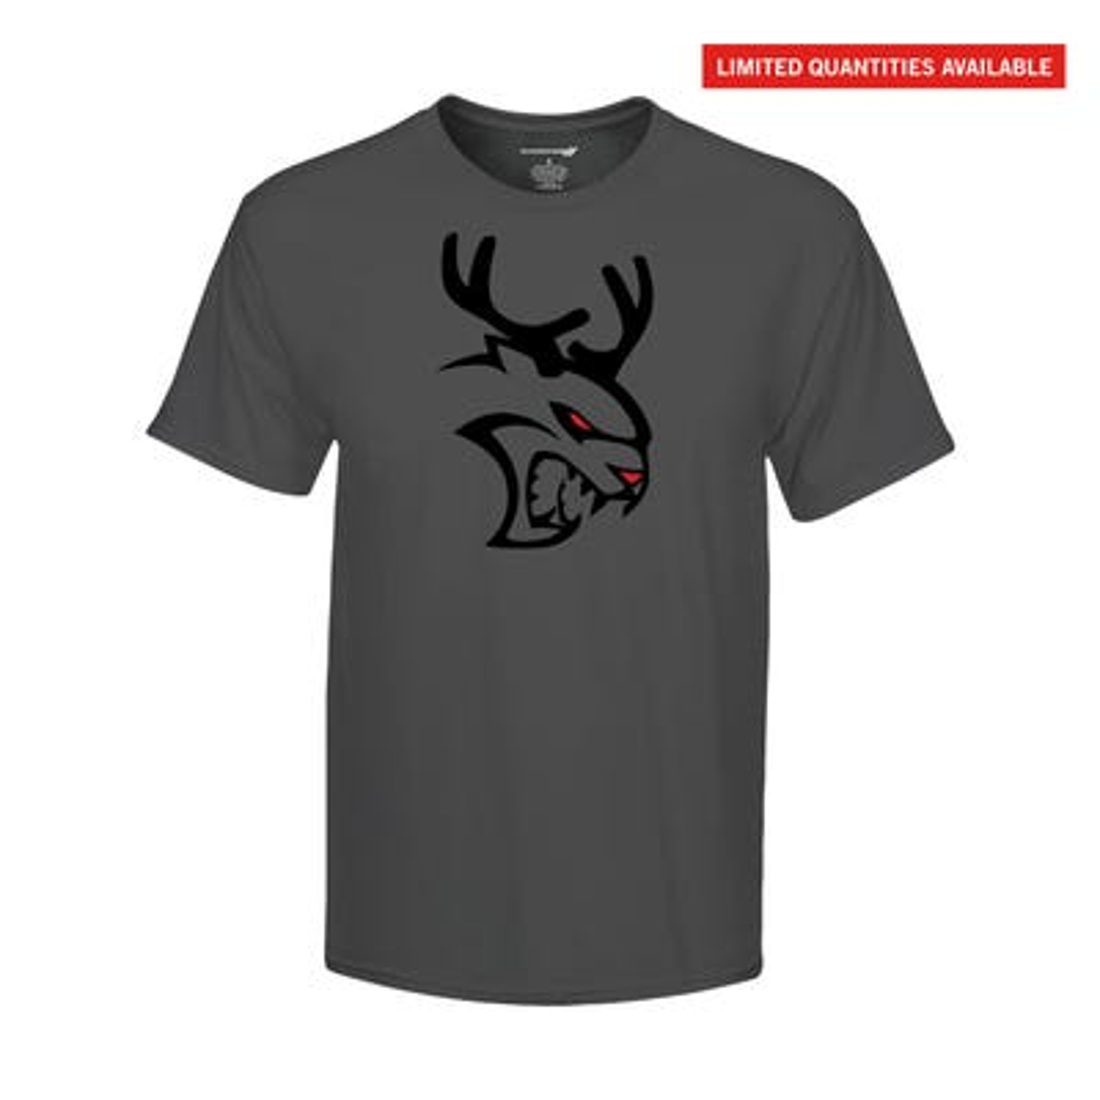 Hellcat Redeye Reindeer T-shirt